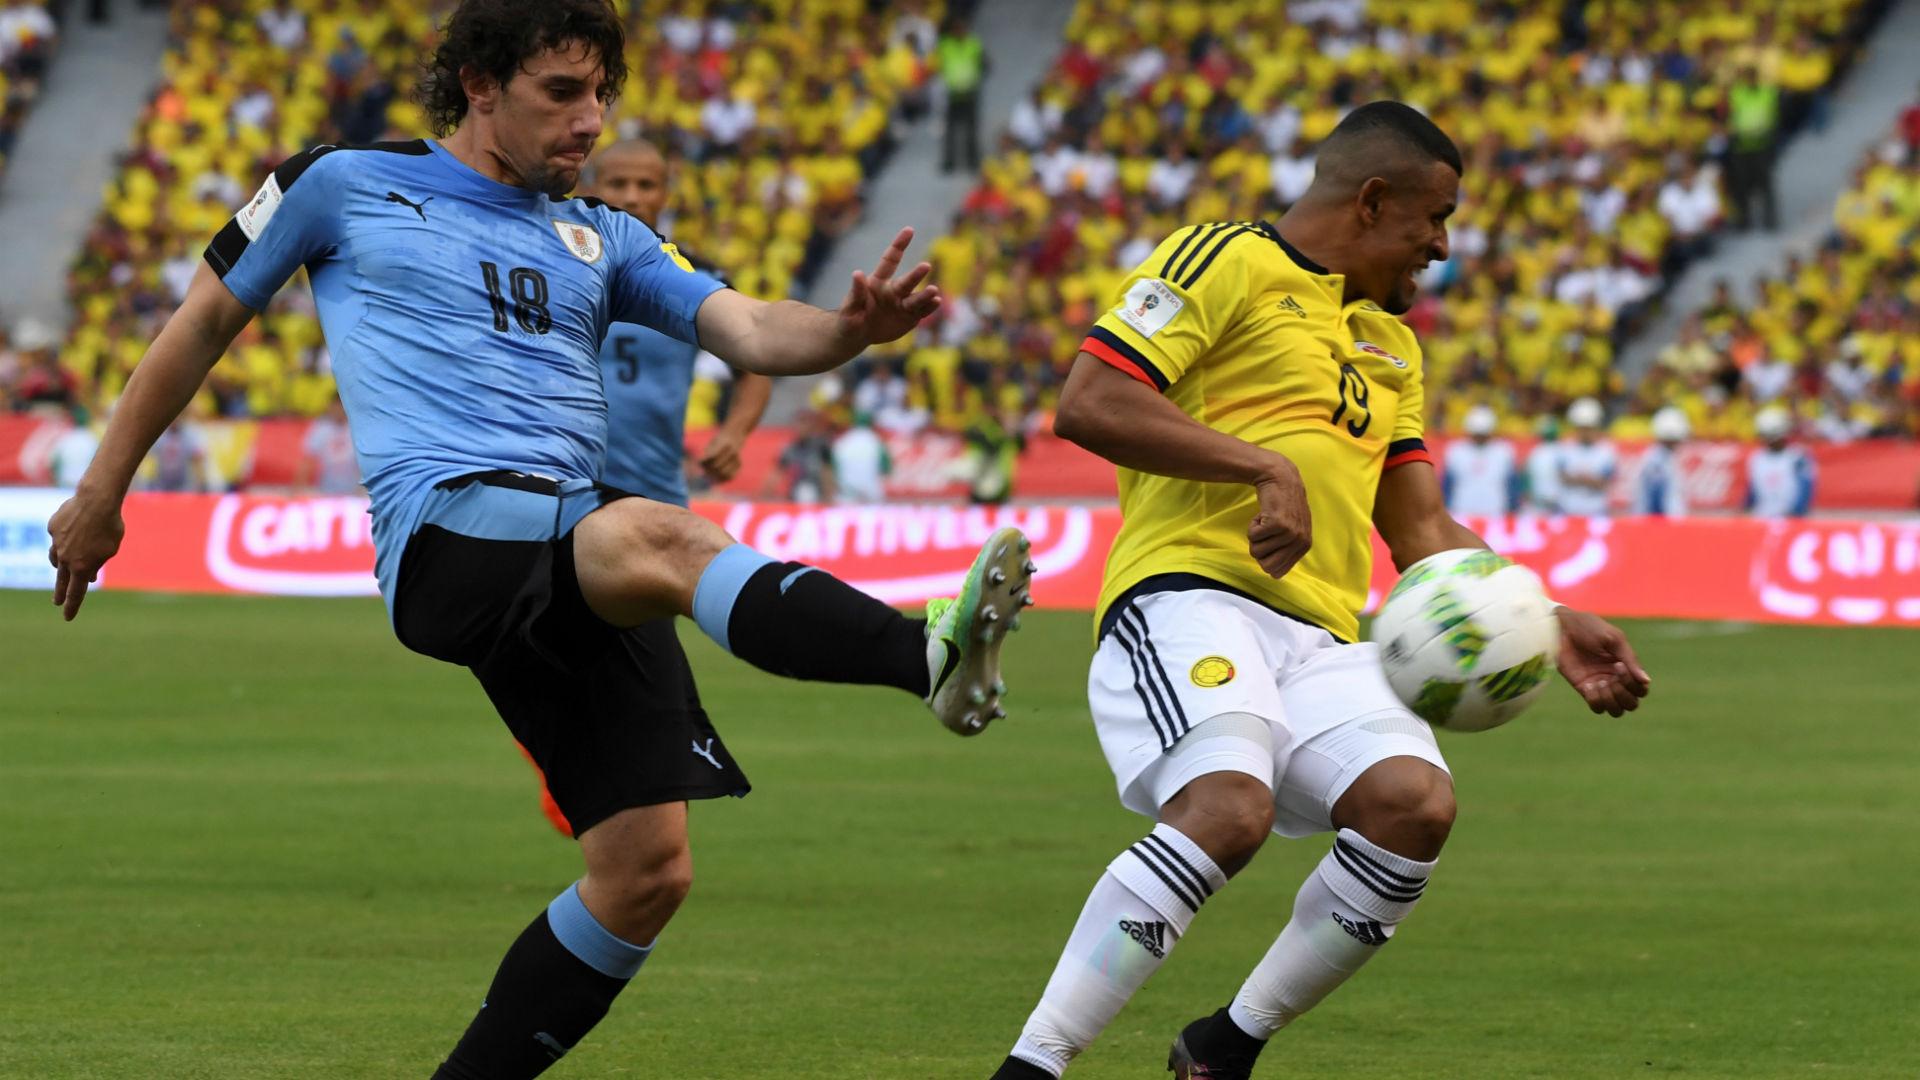 Farid Díaz Colombia vs Uruguay Eliminatoria 2016